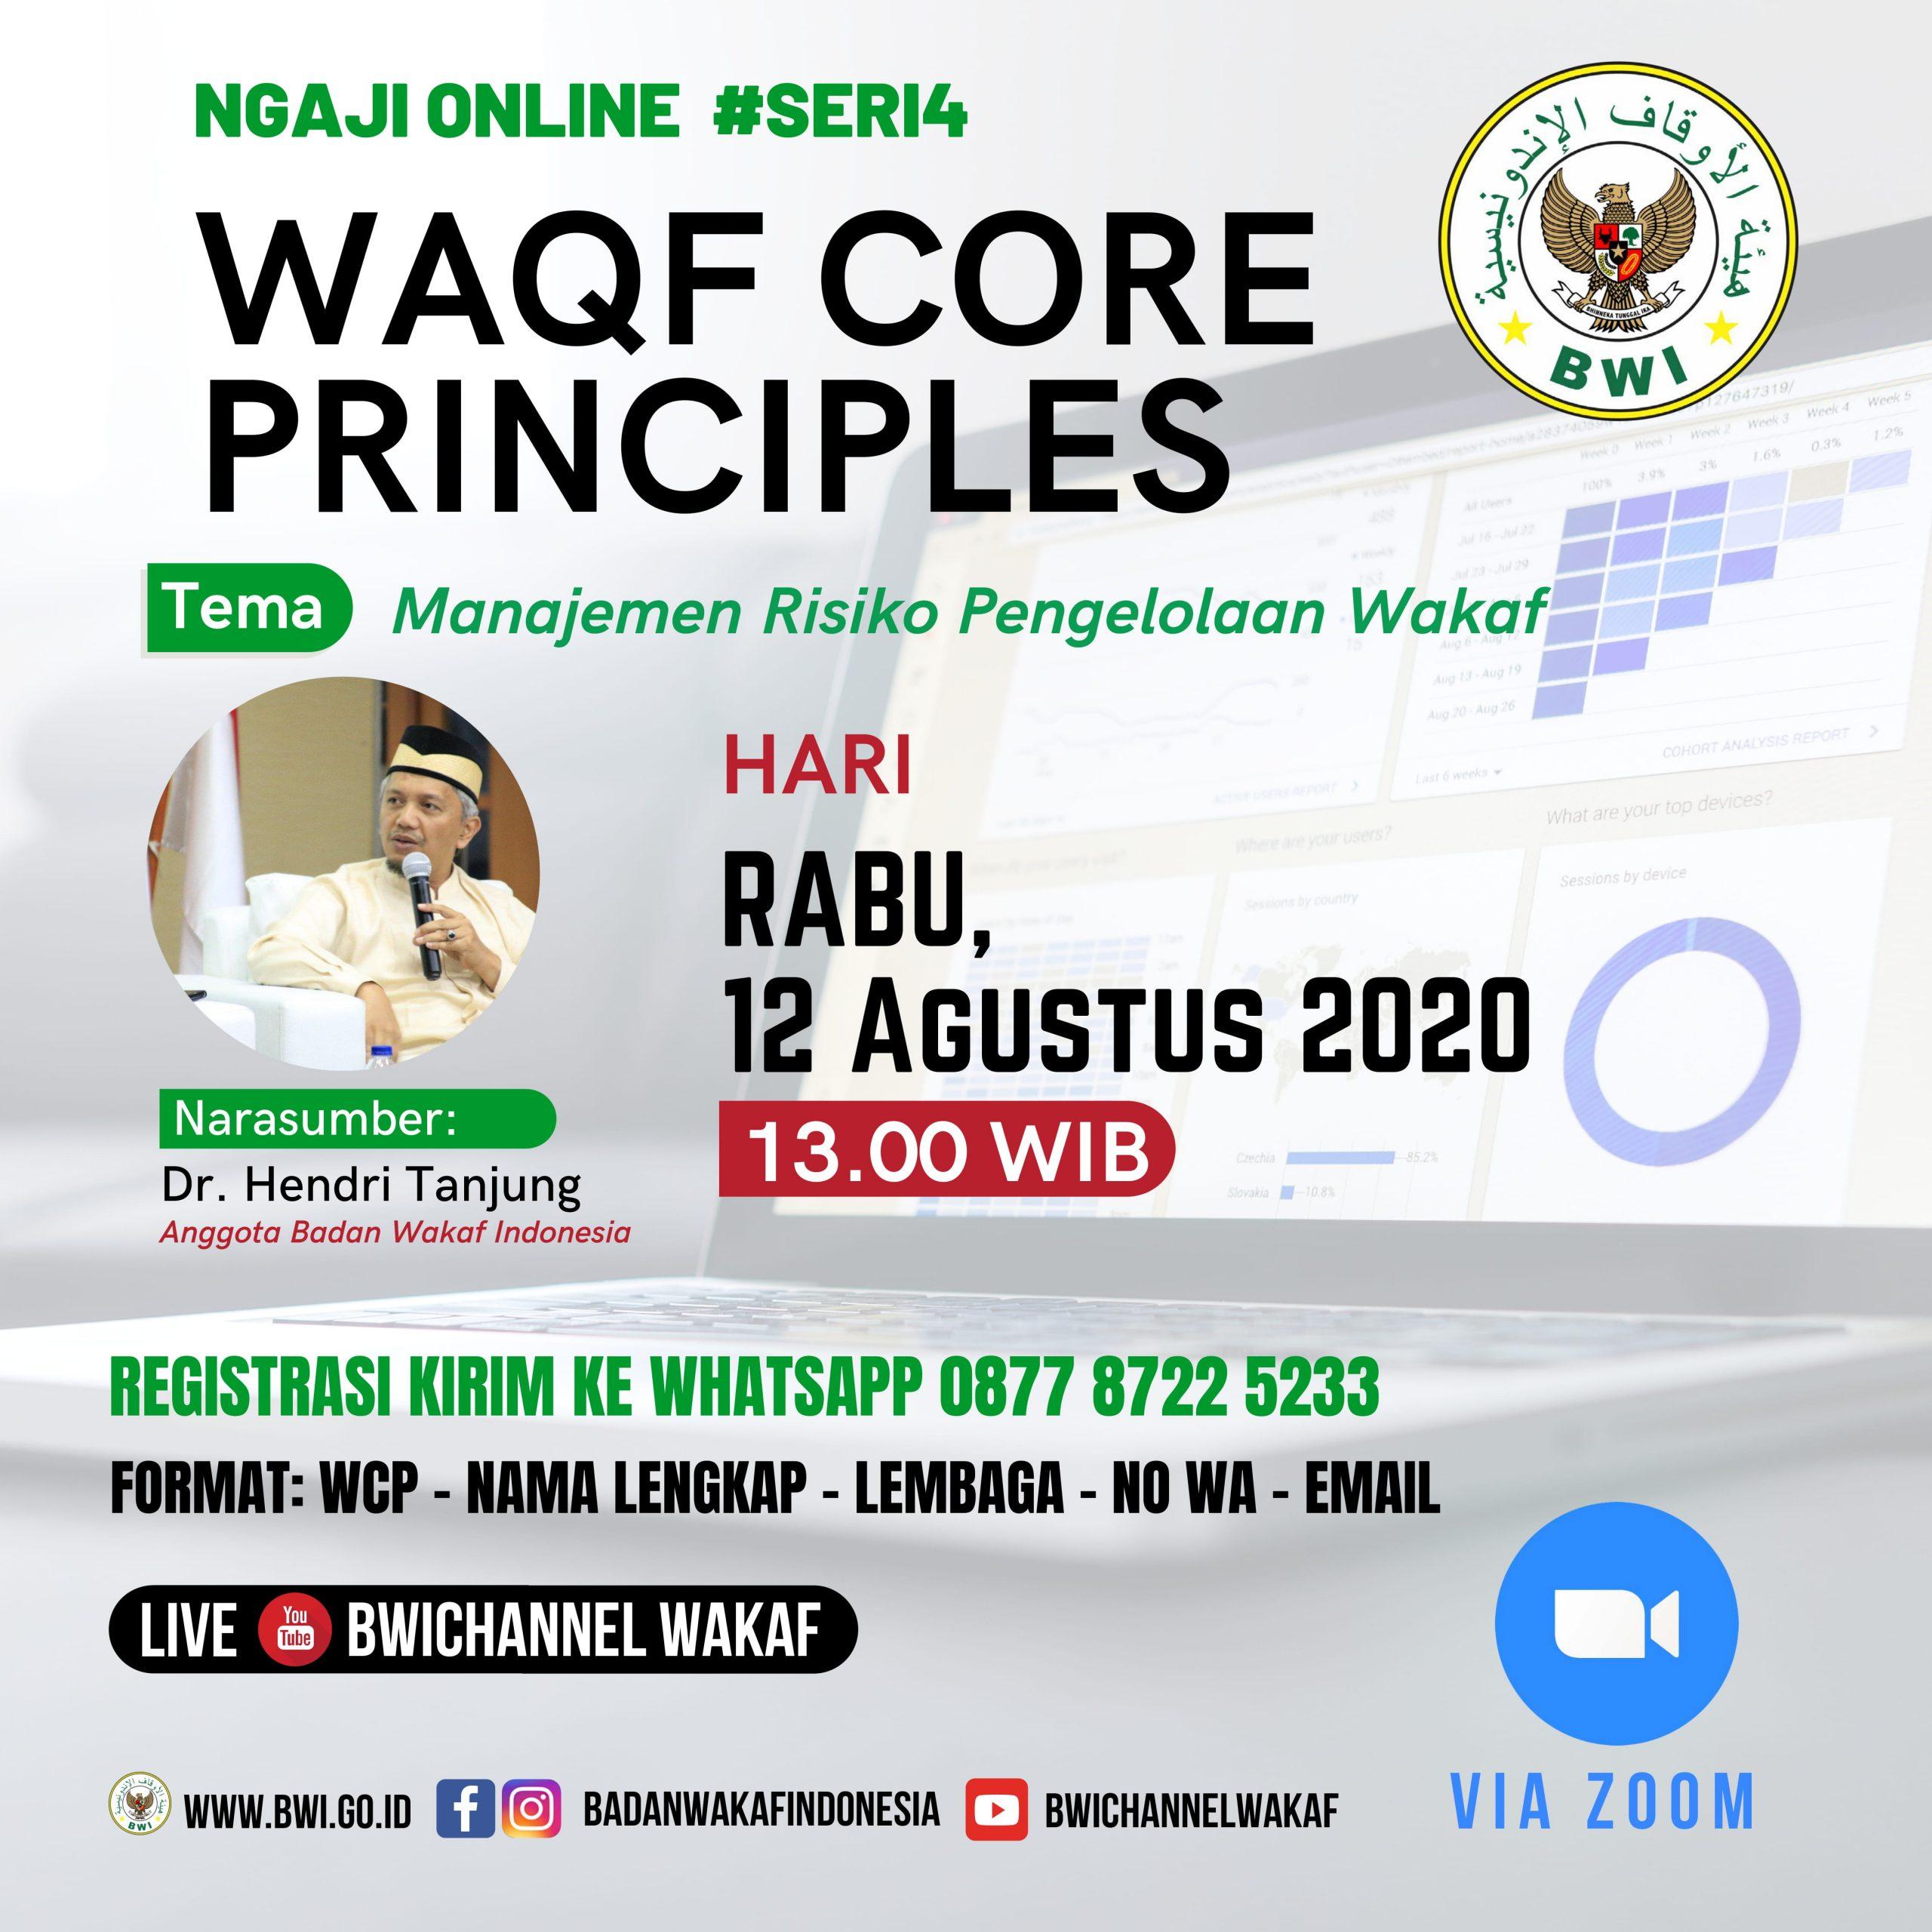 Event- Waqf Core Prinsiple: Manajemen Risiko Pengelolaan Wakaf  - 20200811 Ngaji Online WCP 1 scaled - Event- Waqf Core Prinsiple: Manajemen Risiko Pengelolaan Wakaf